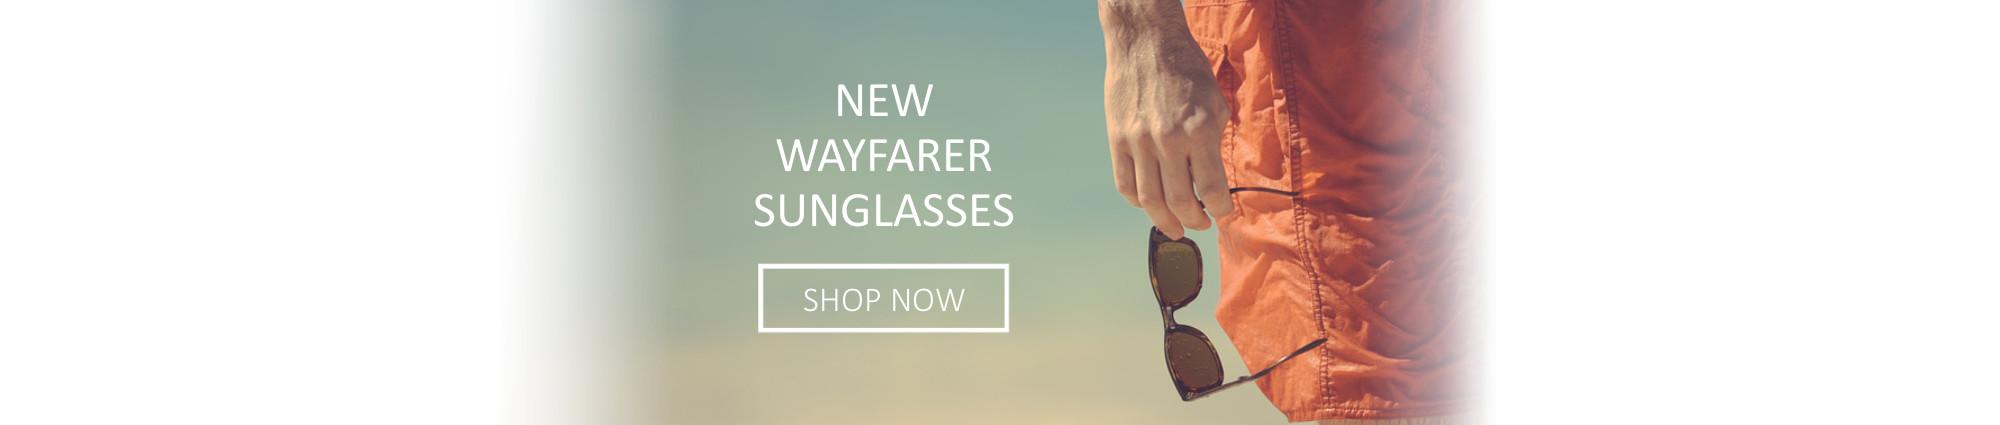 Epic Brand New Wayfarer Style Sunglasses